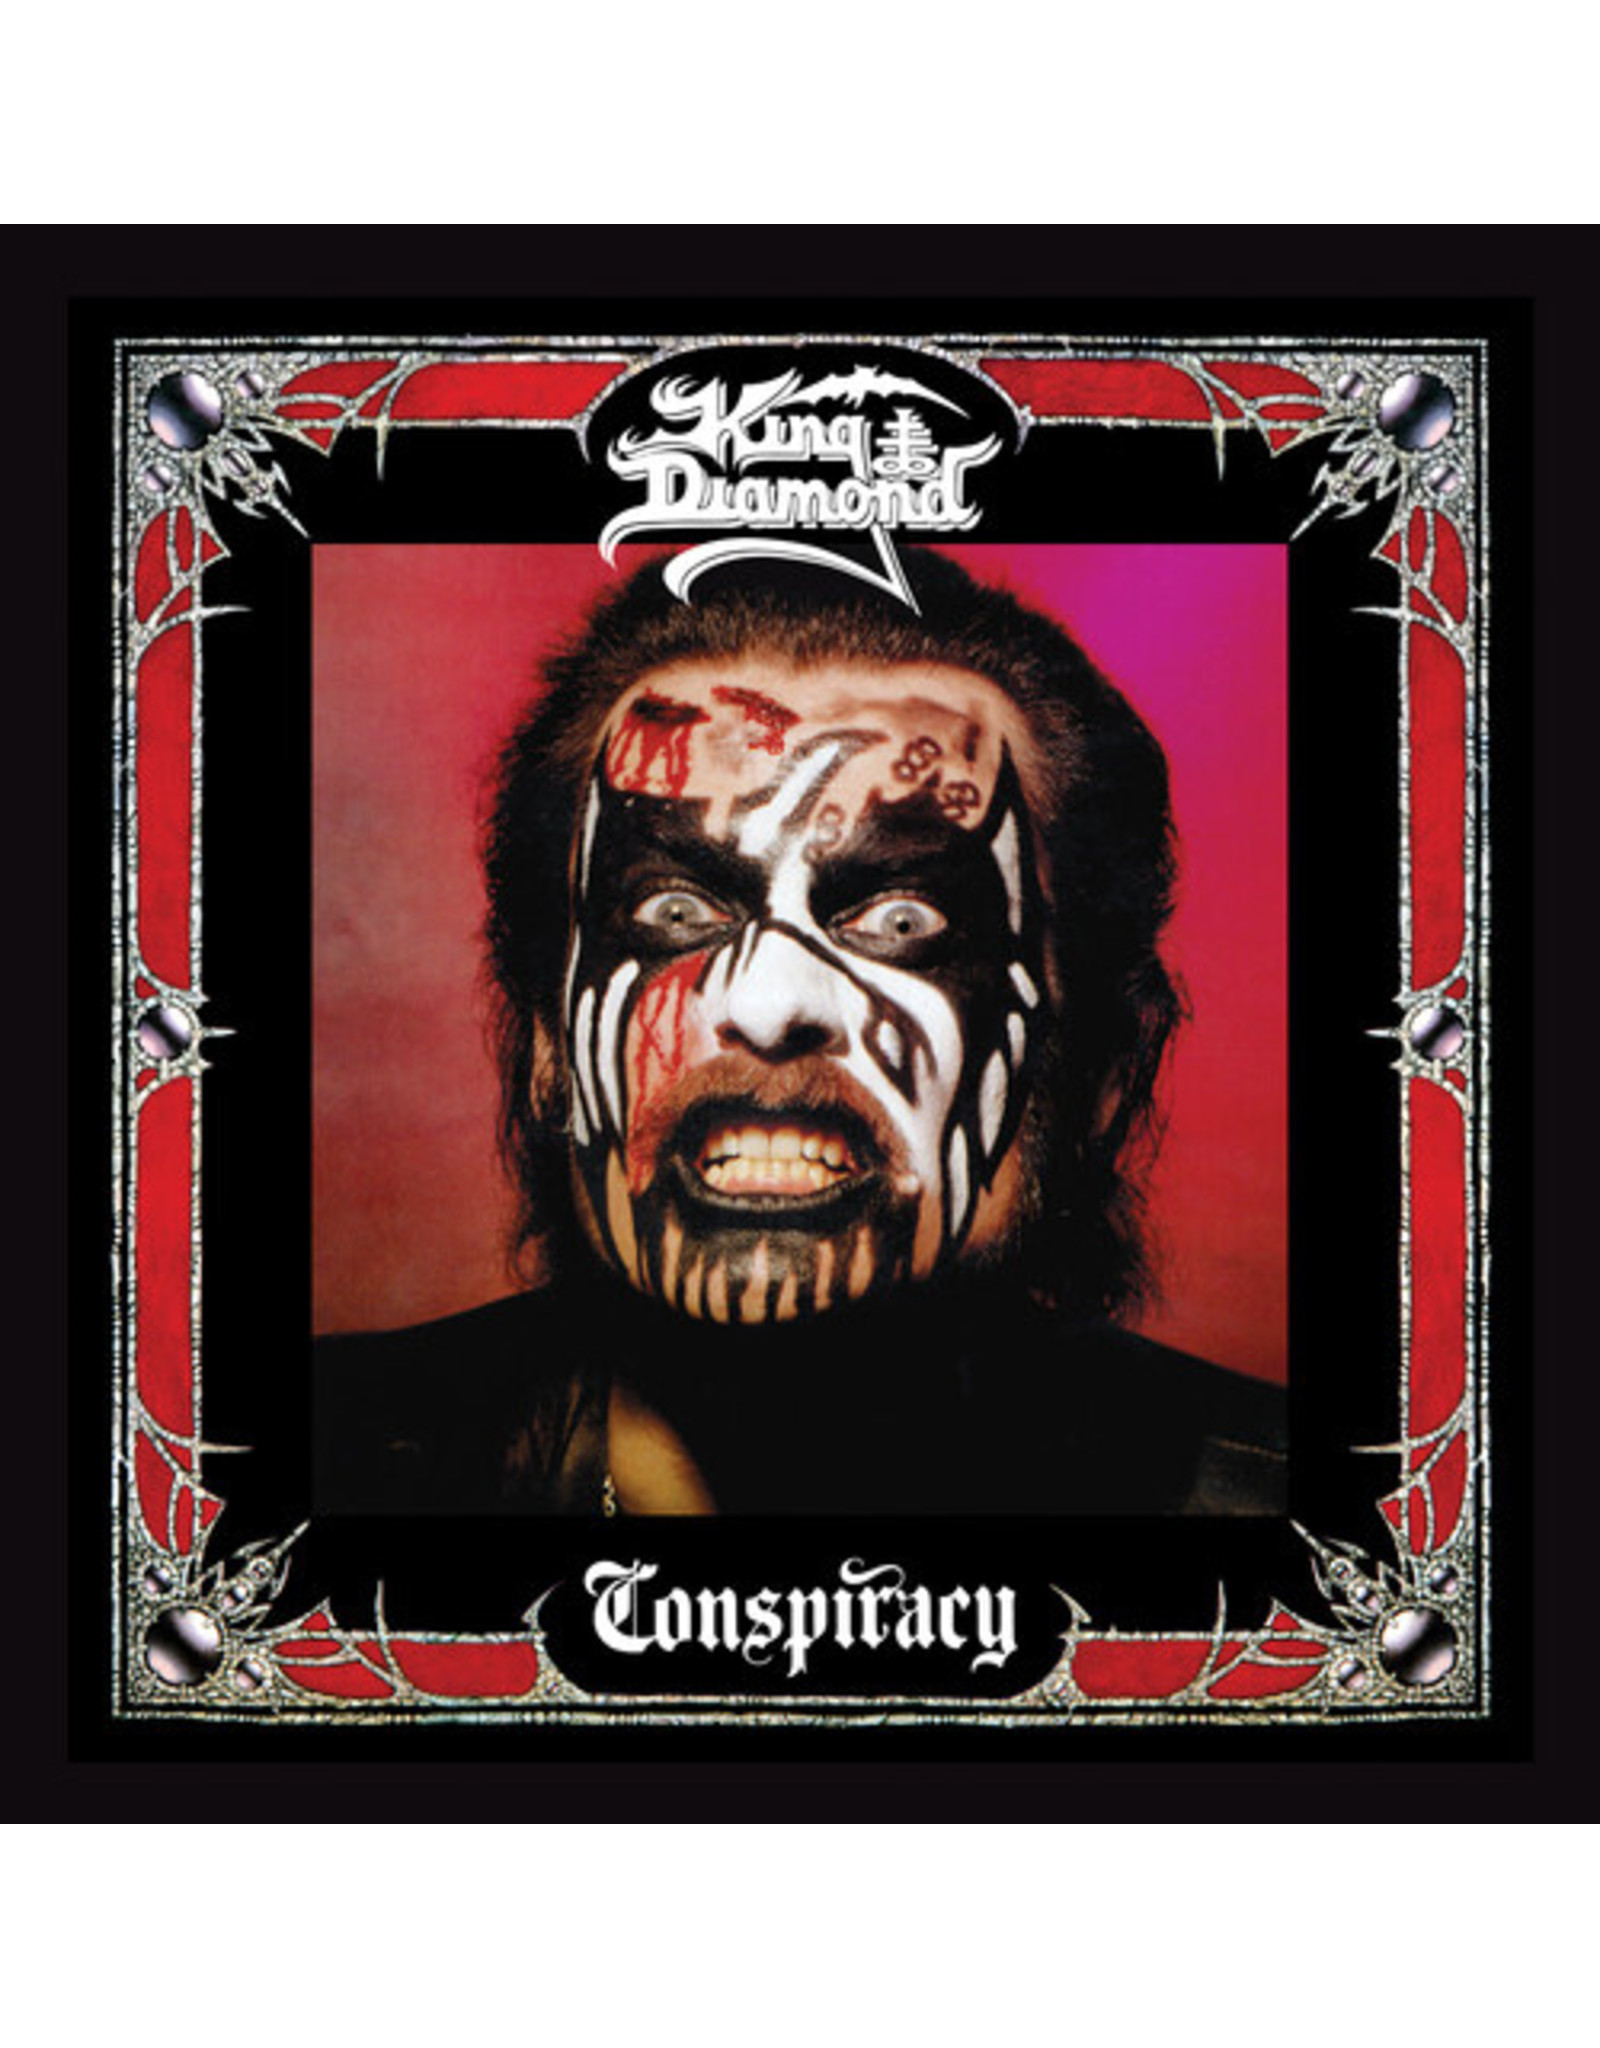 New Vinyl King Diamond - Conspiracy (Colored) LP